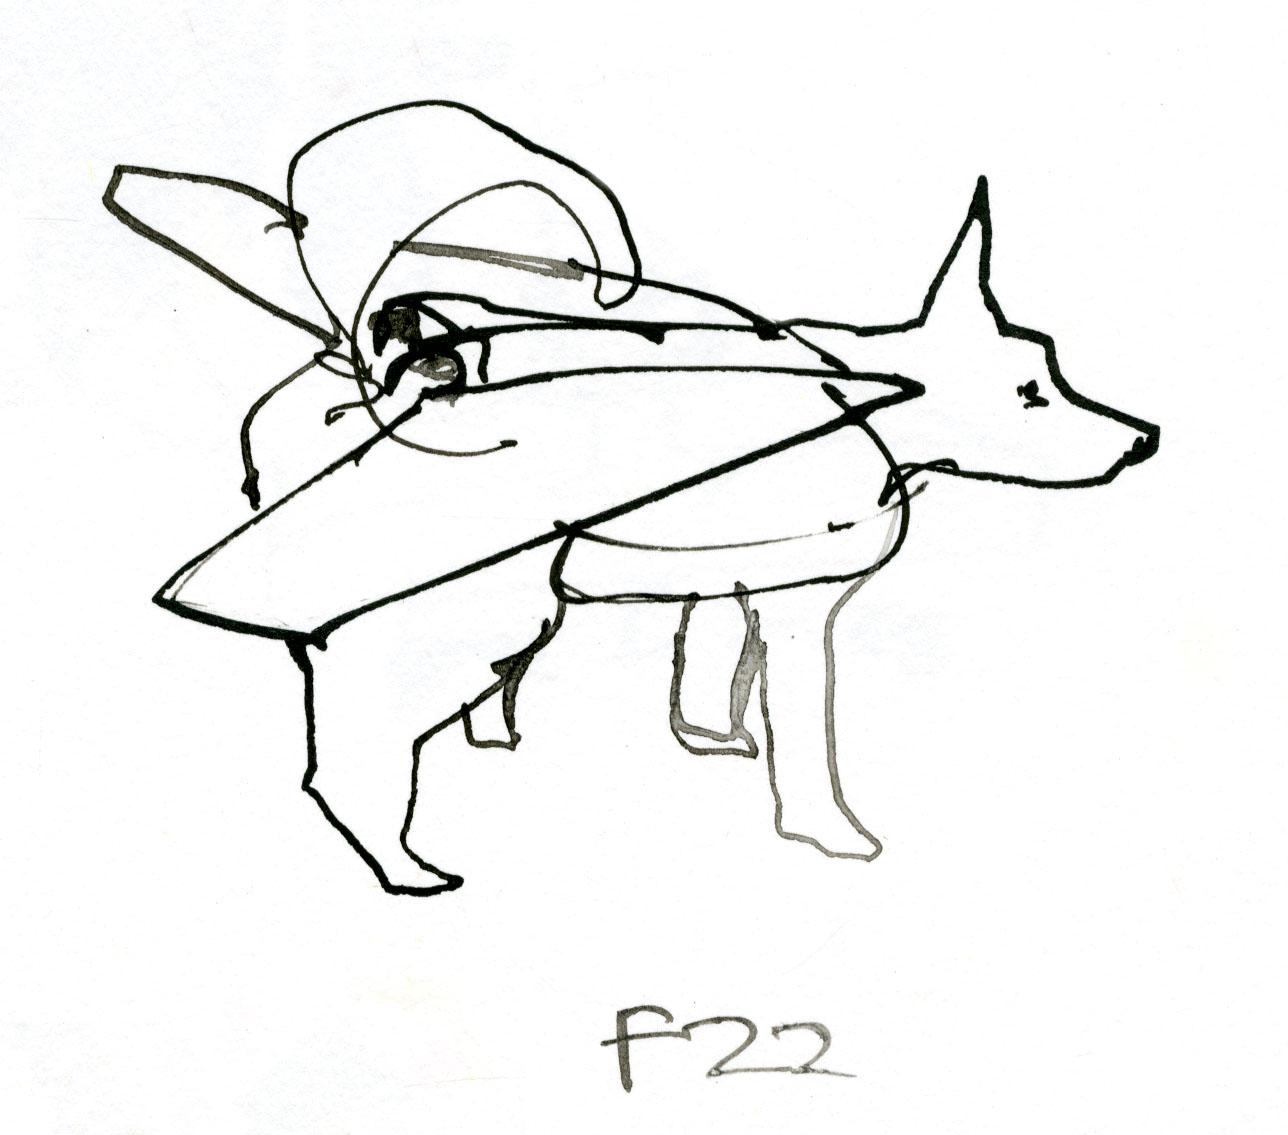 F22 Bomber dog © Carly Larsson 2014